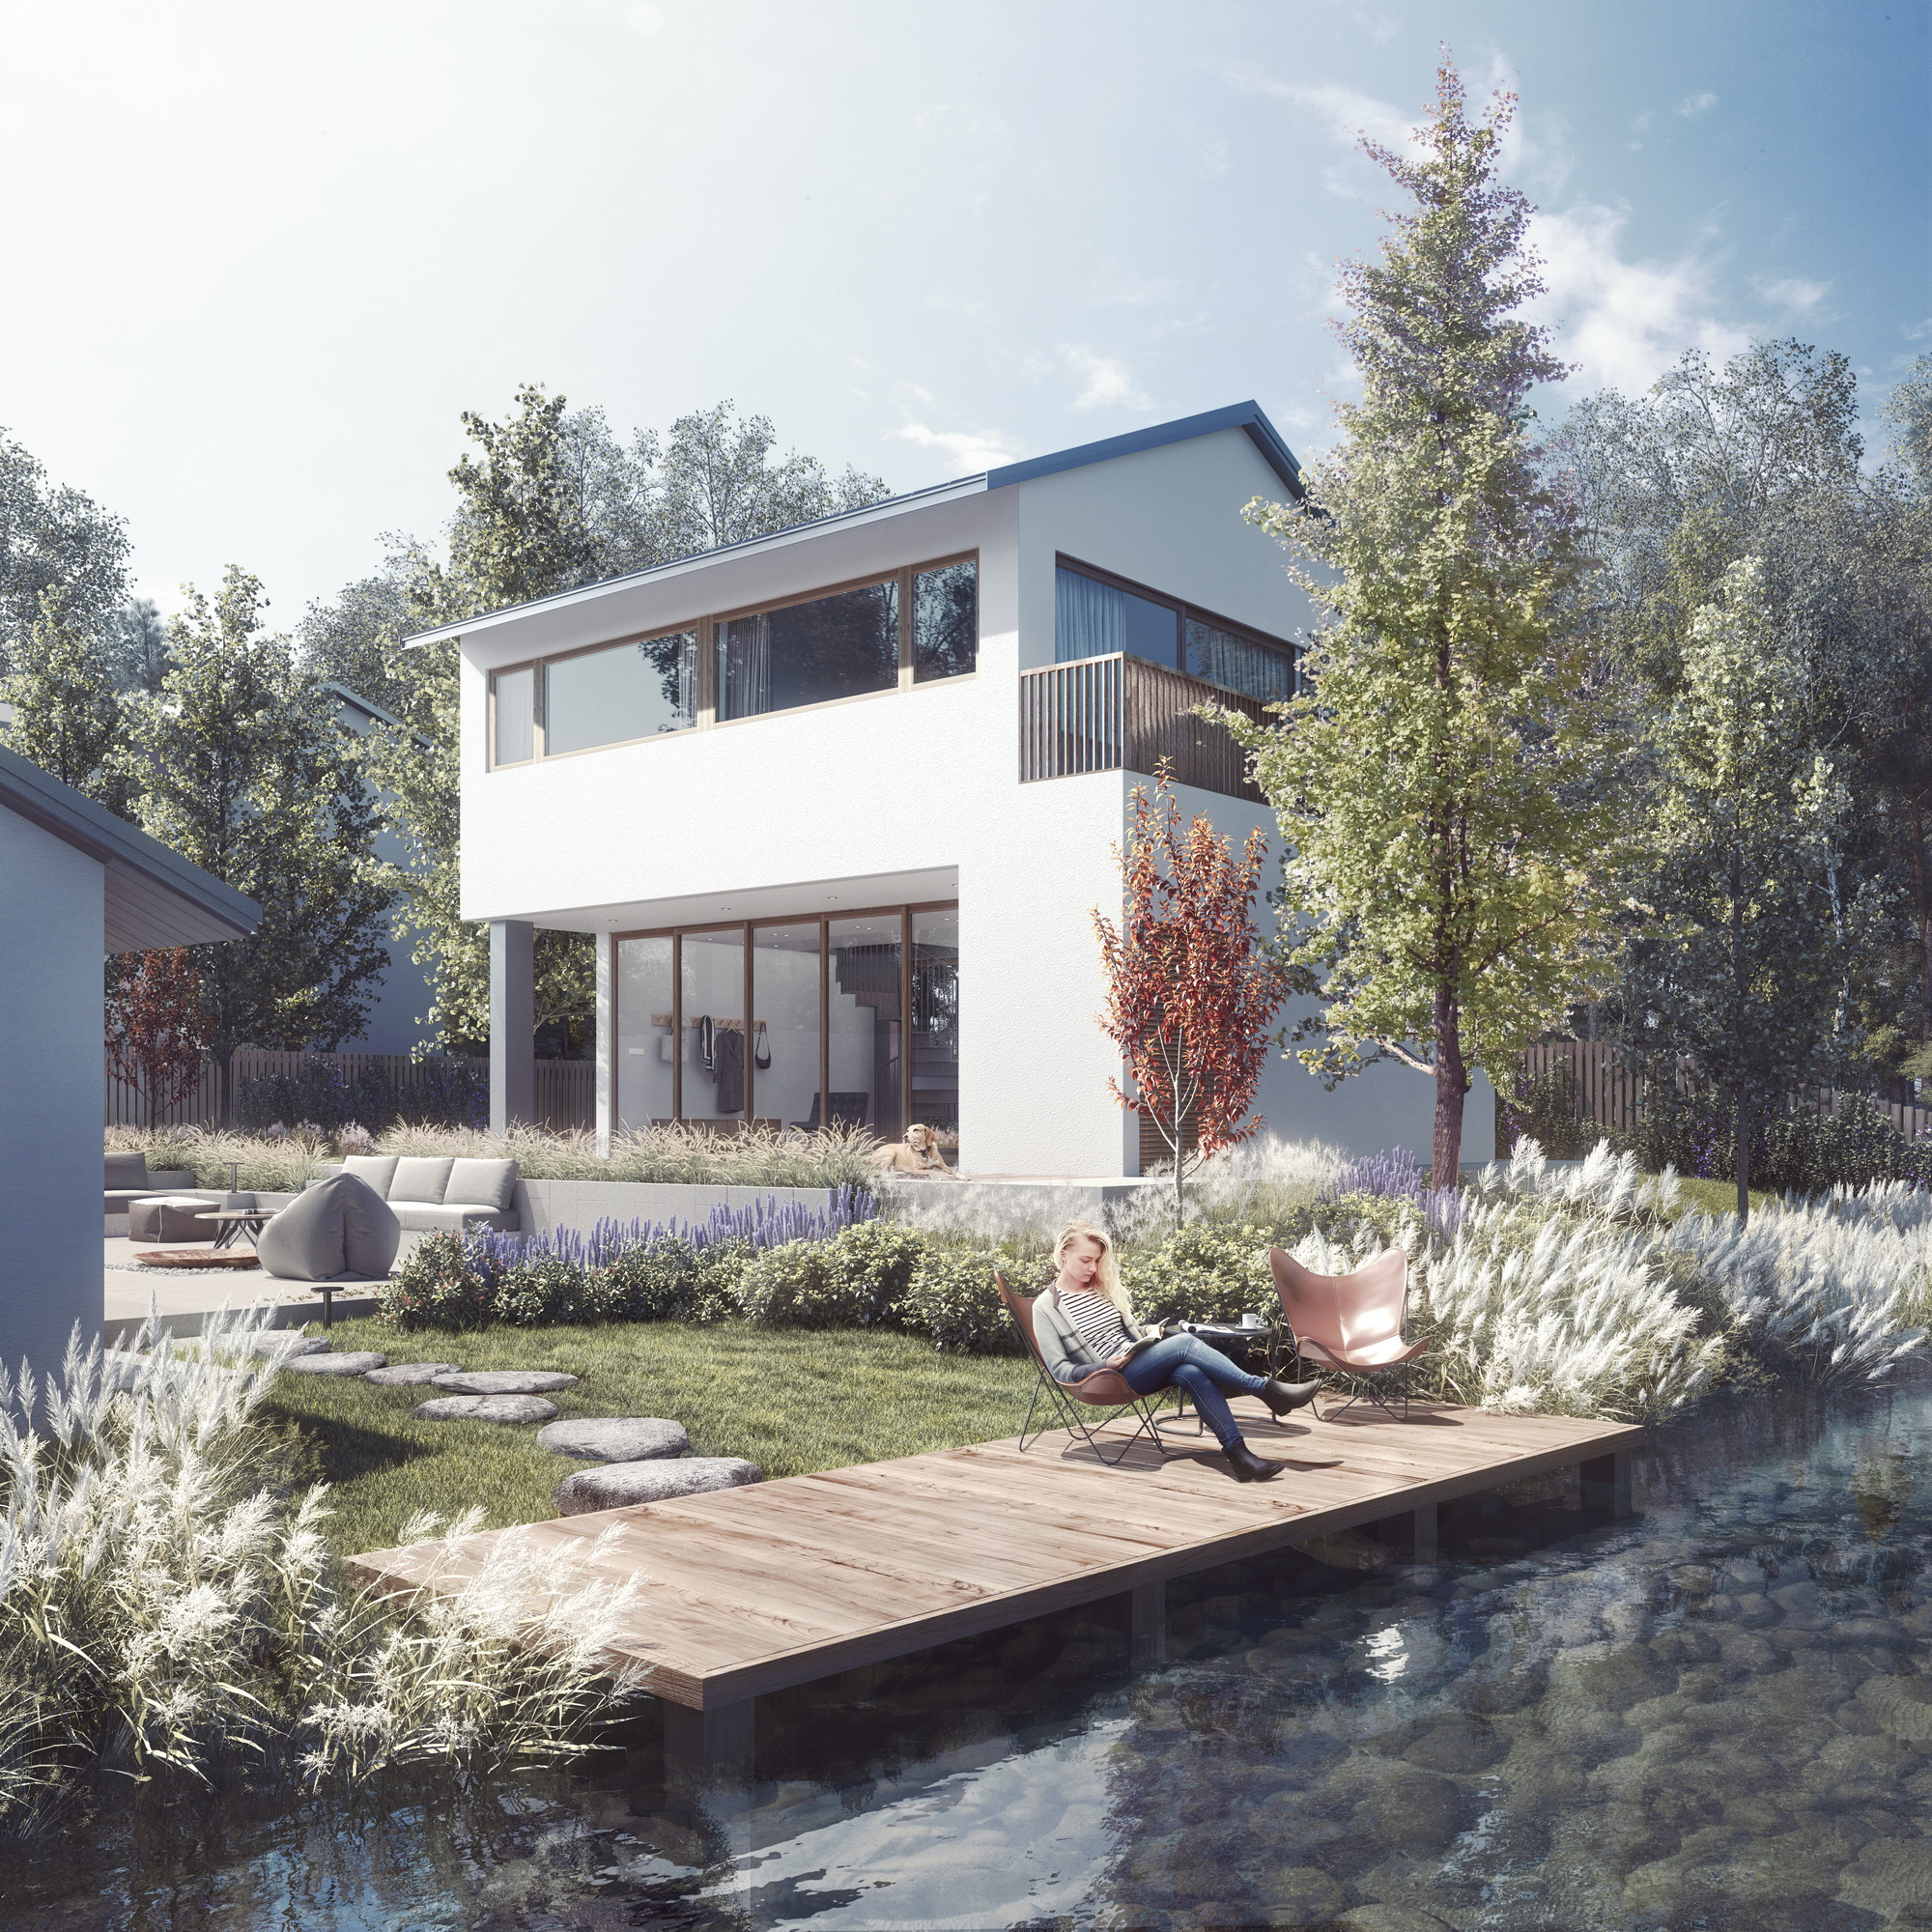 201812009-Y-design-house,view-c02_调整大小